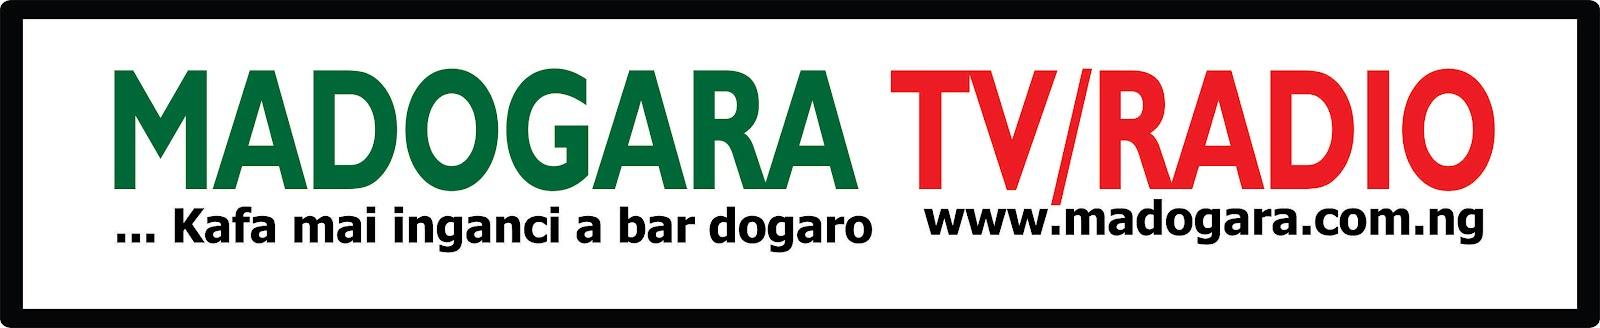 Madogara